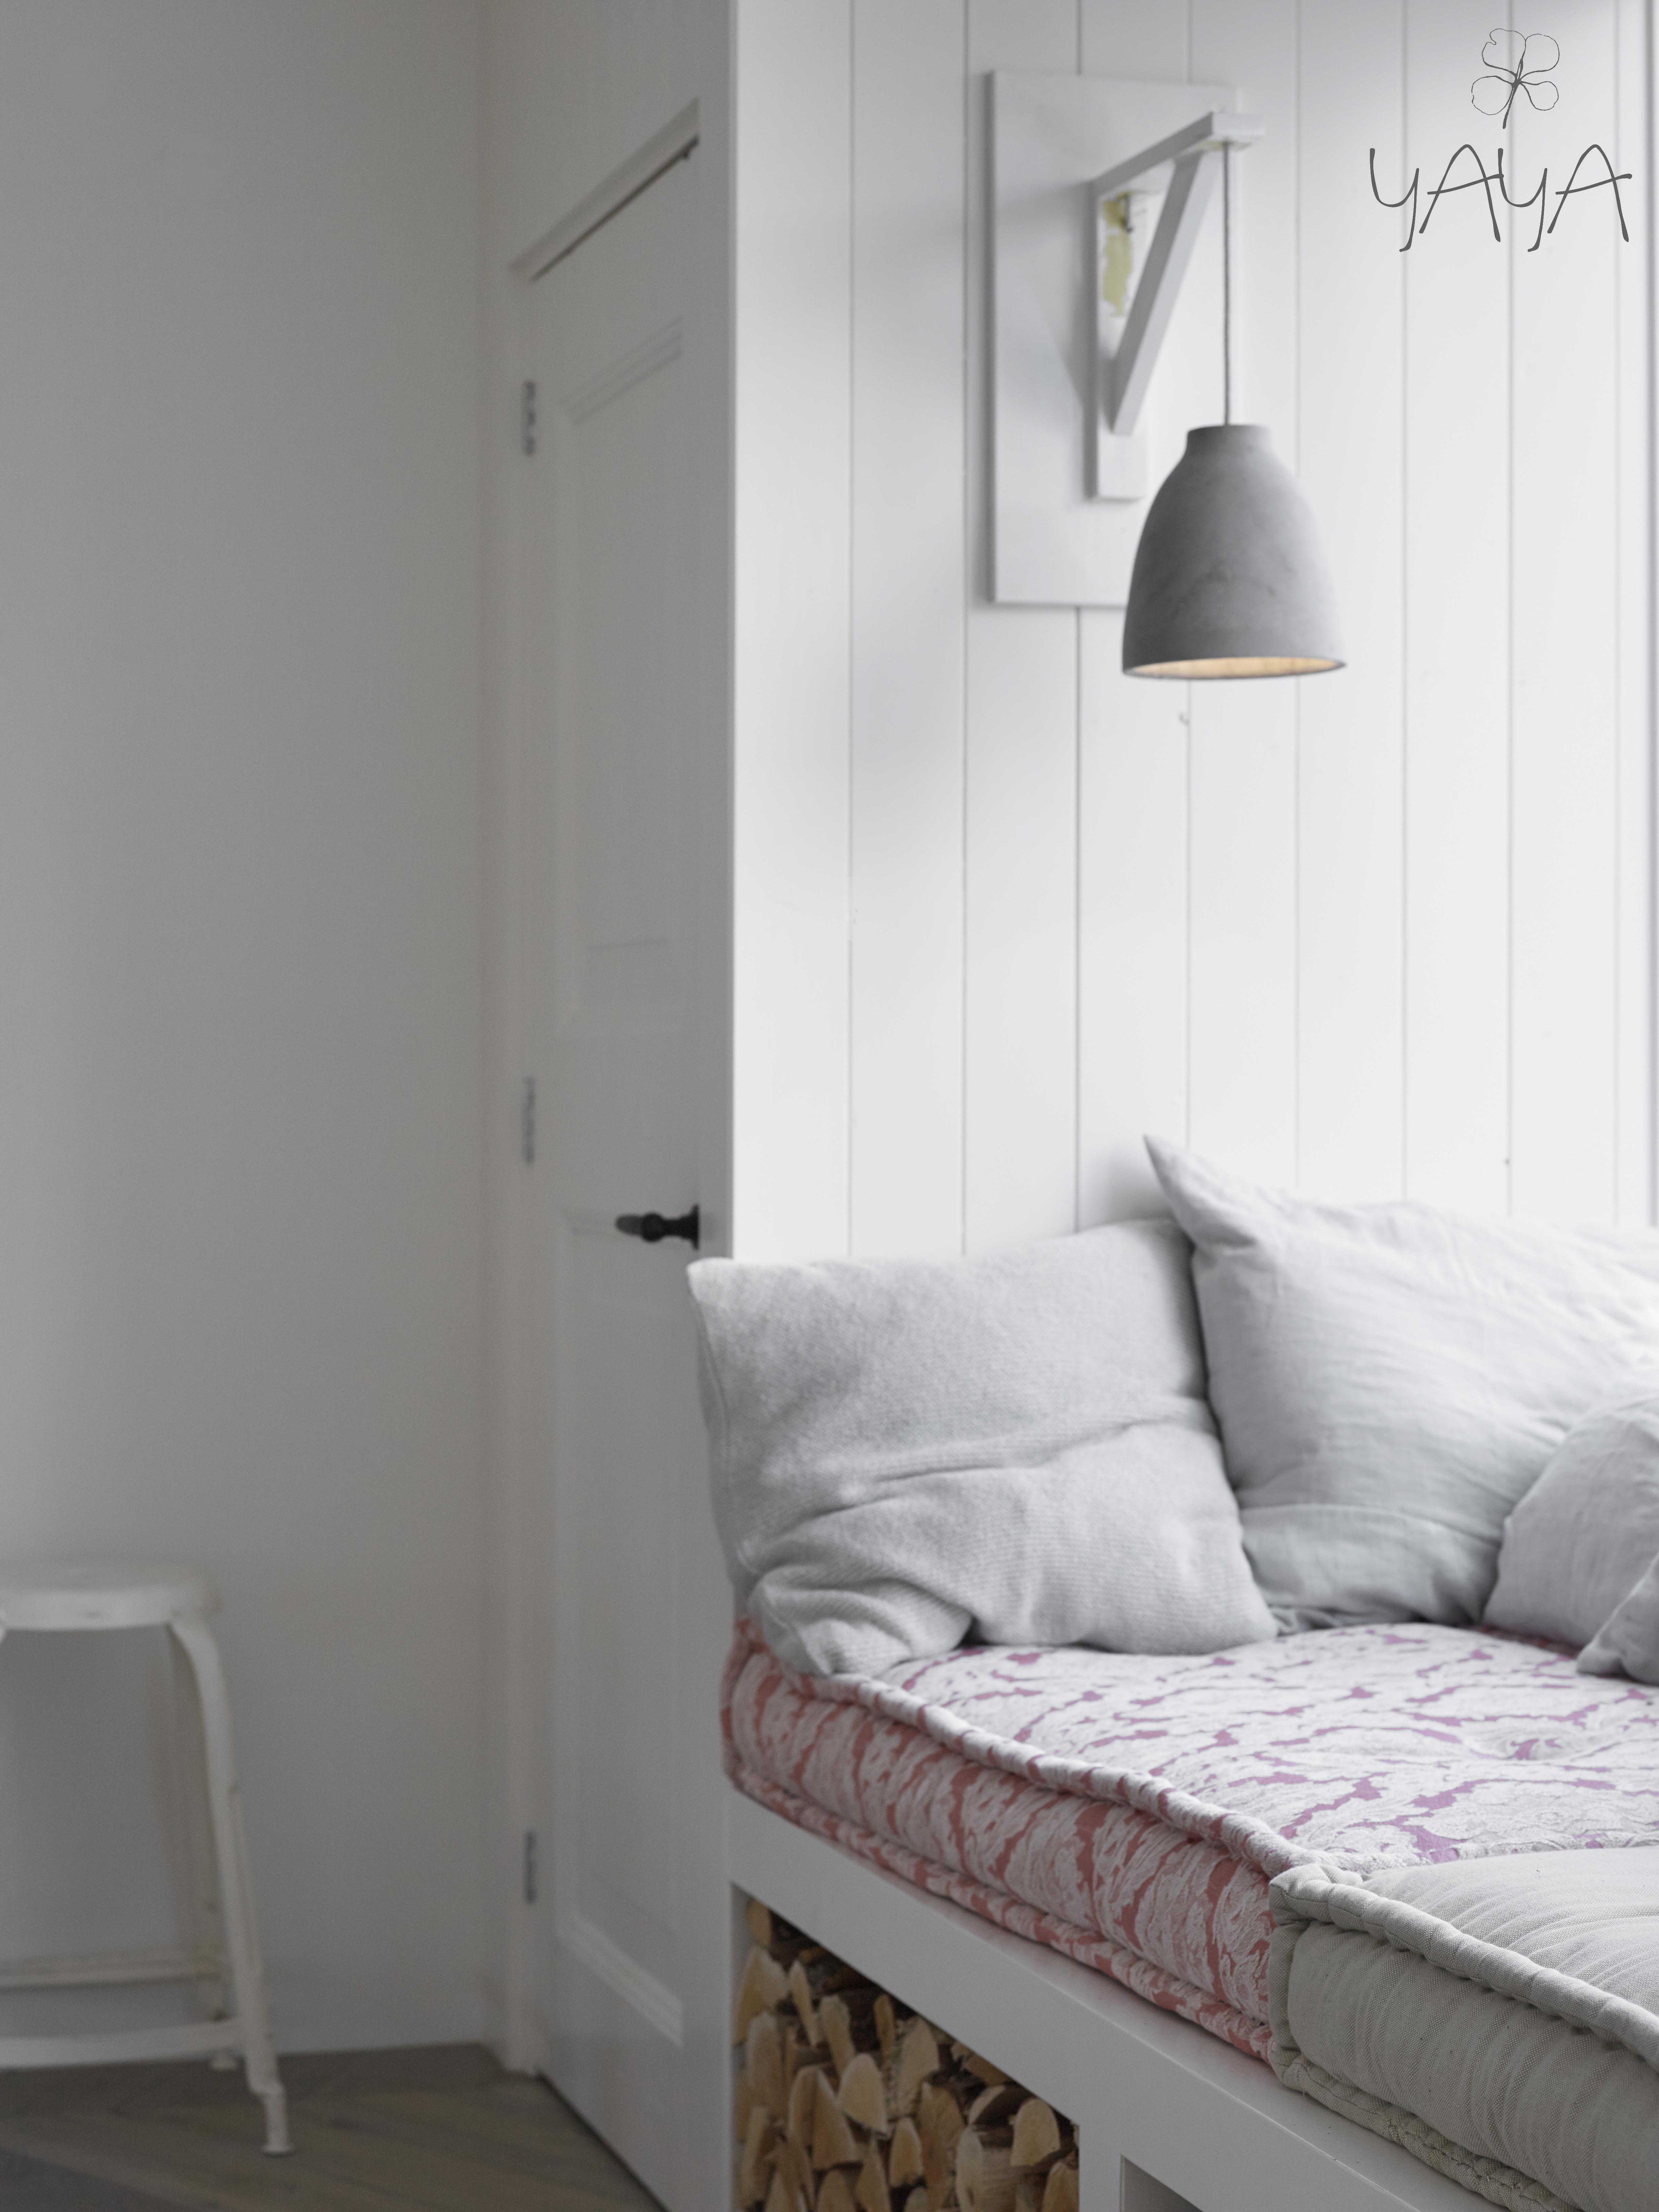 Window nook decorating ideas  amslax  pinterest  cozy nook cozy and bedroom office